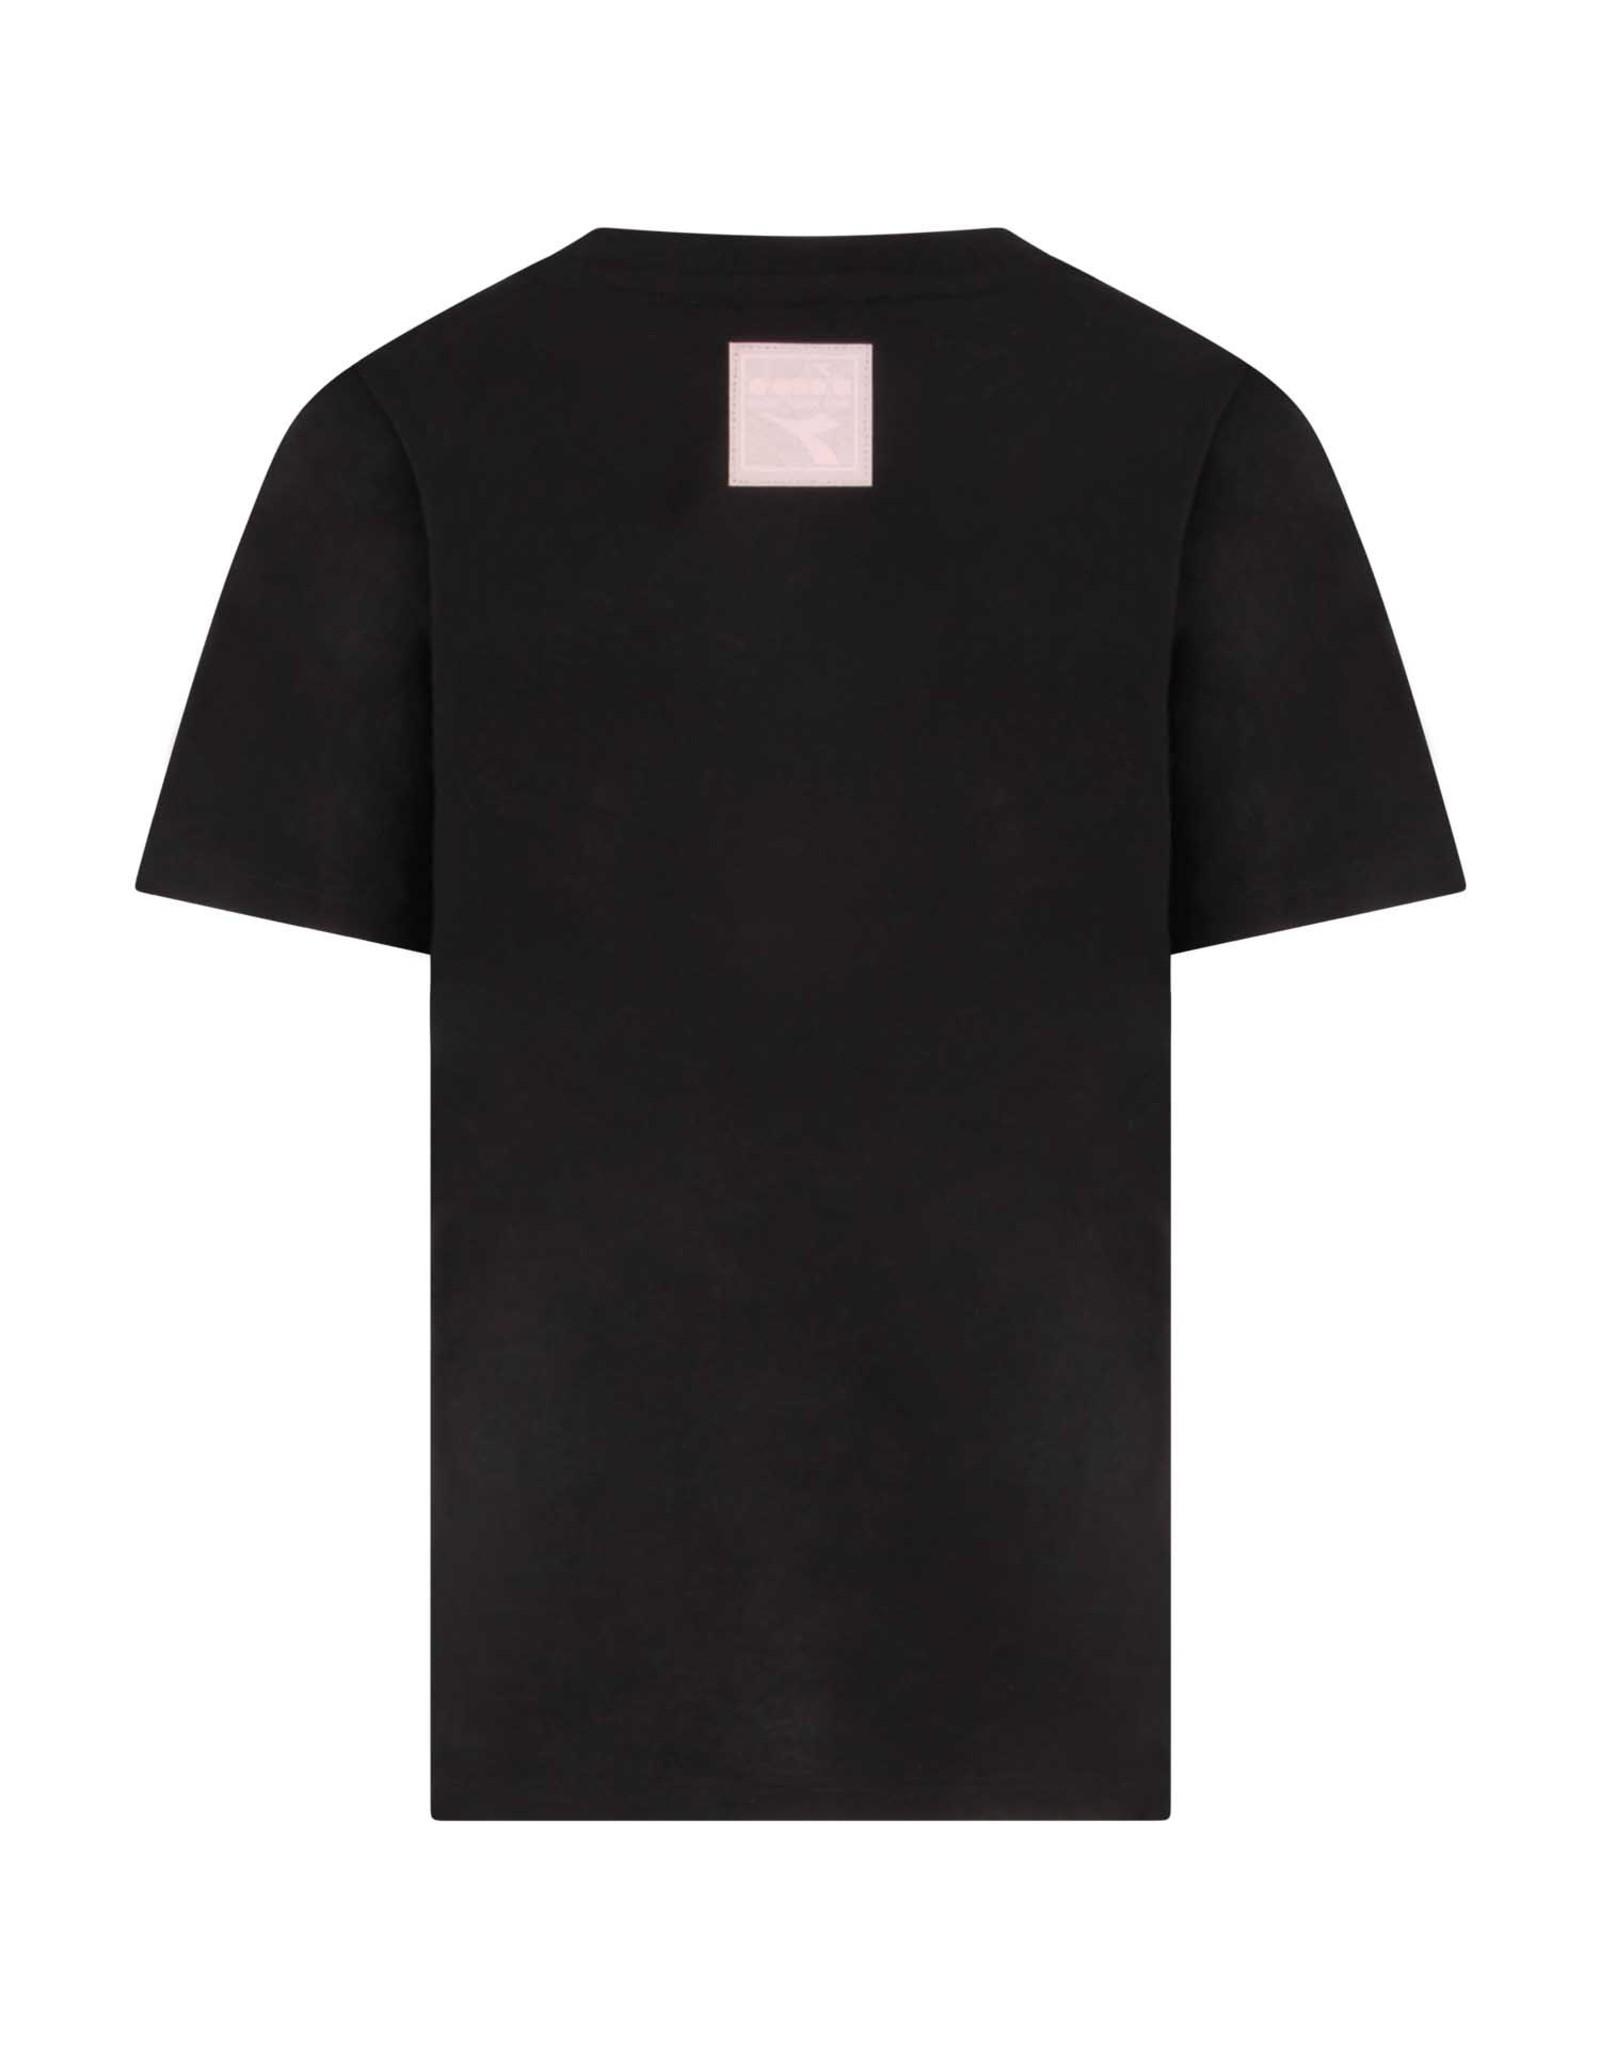 Diadora FW20 26299 T-shirt black